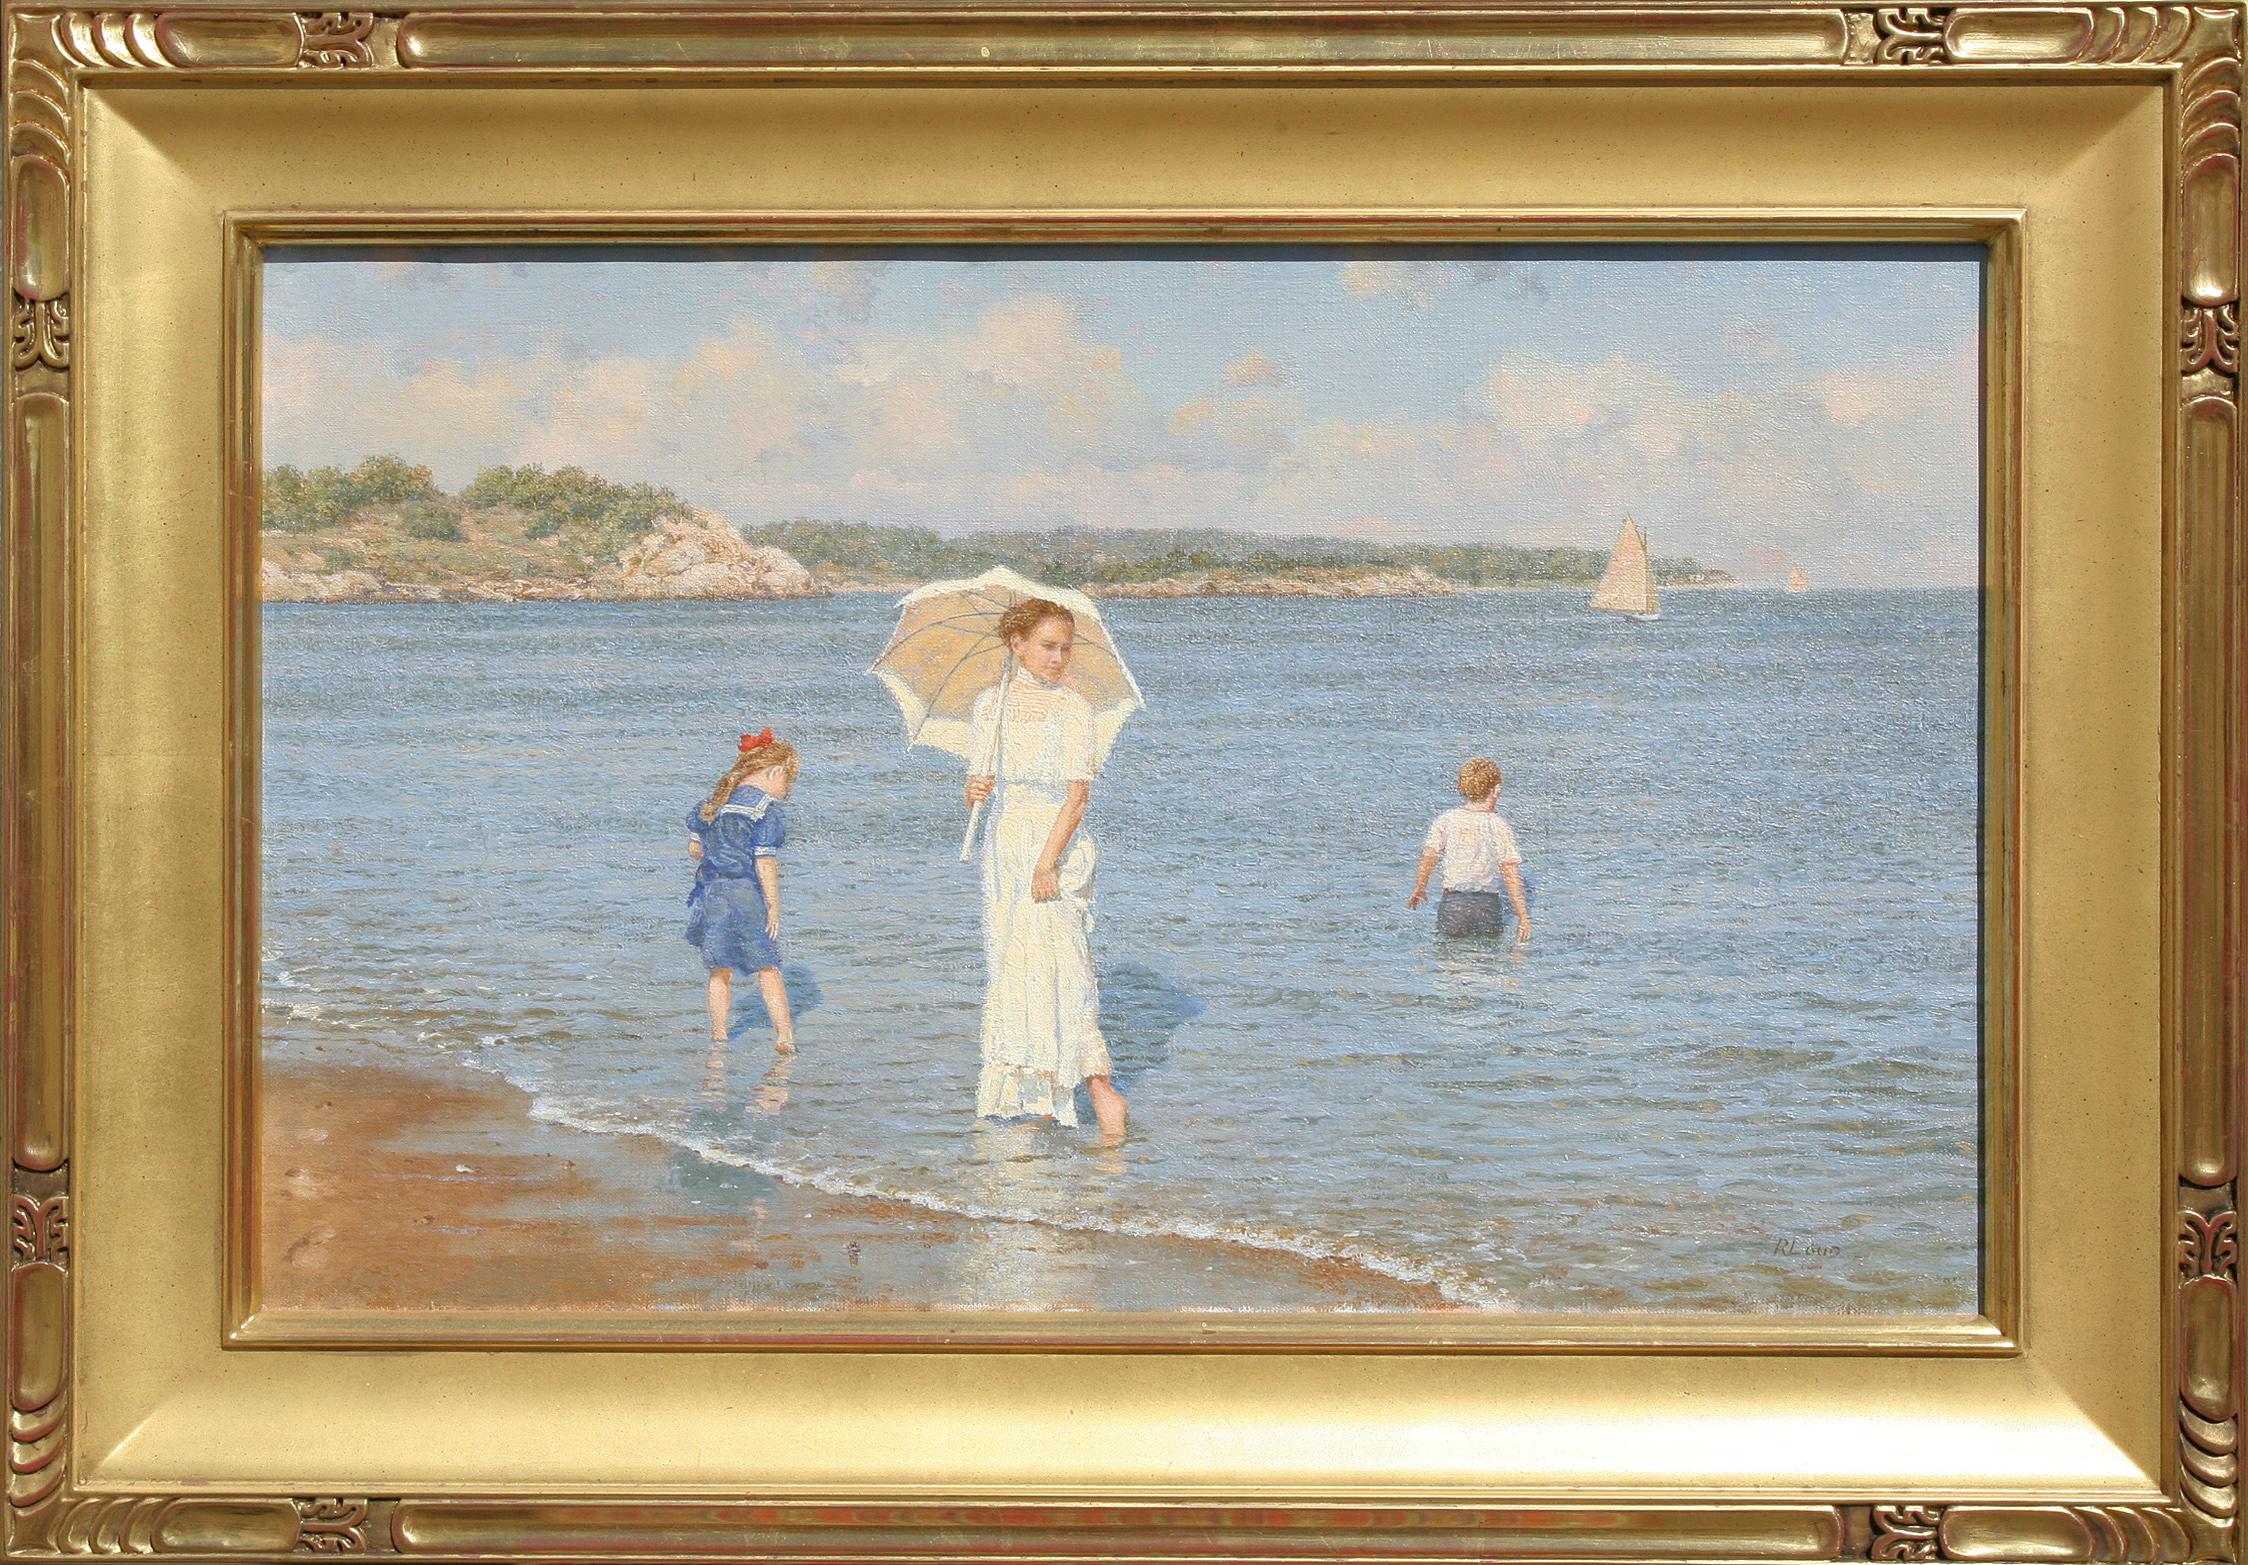 Trade In Marketplace >> - Richard K. Loud Oil on Canvas | Rafael Osona Auctions ...